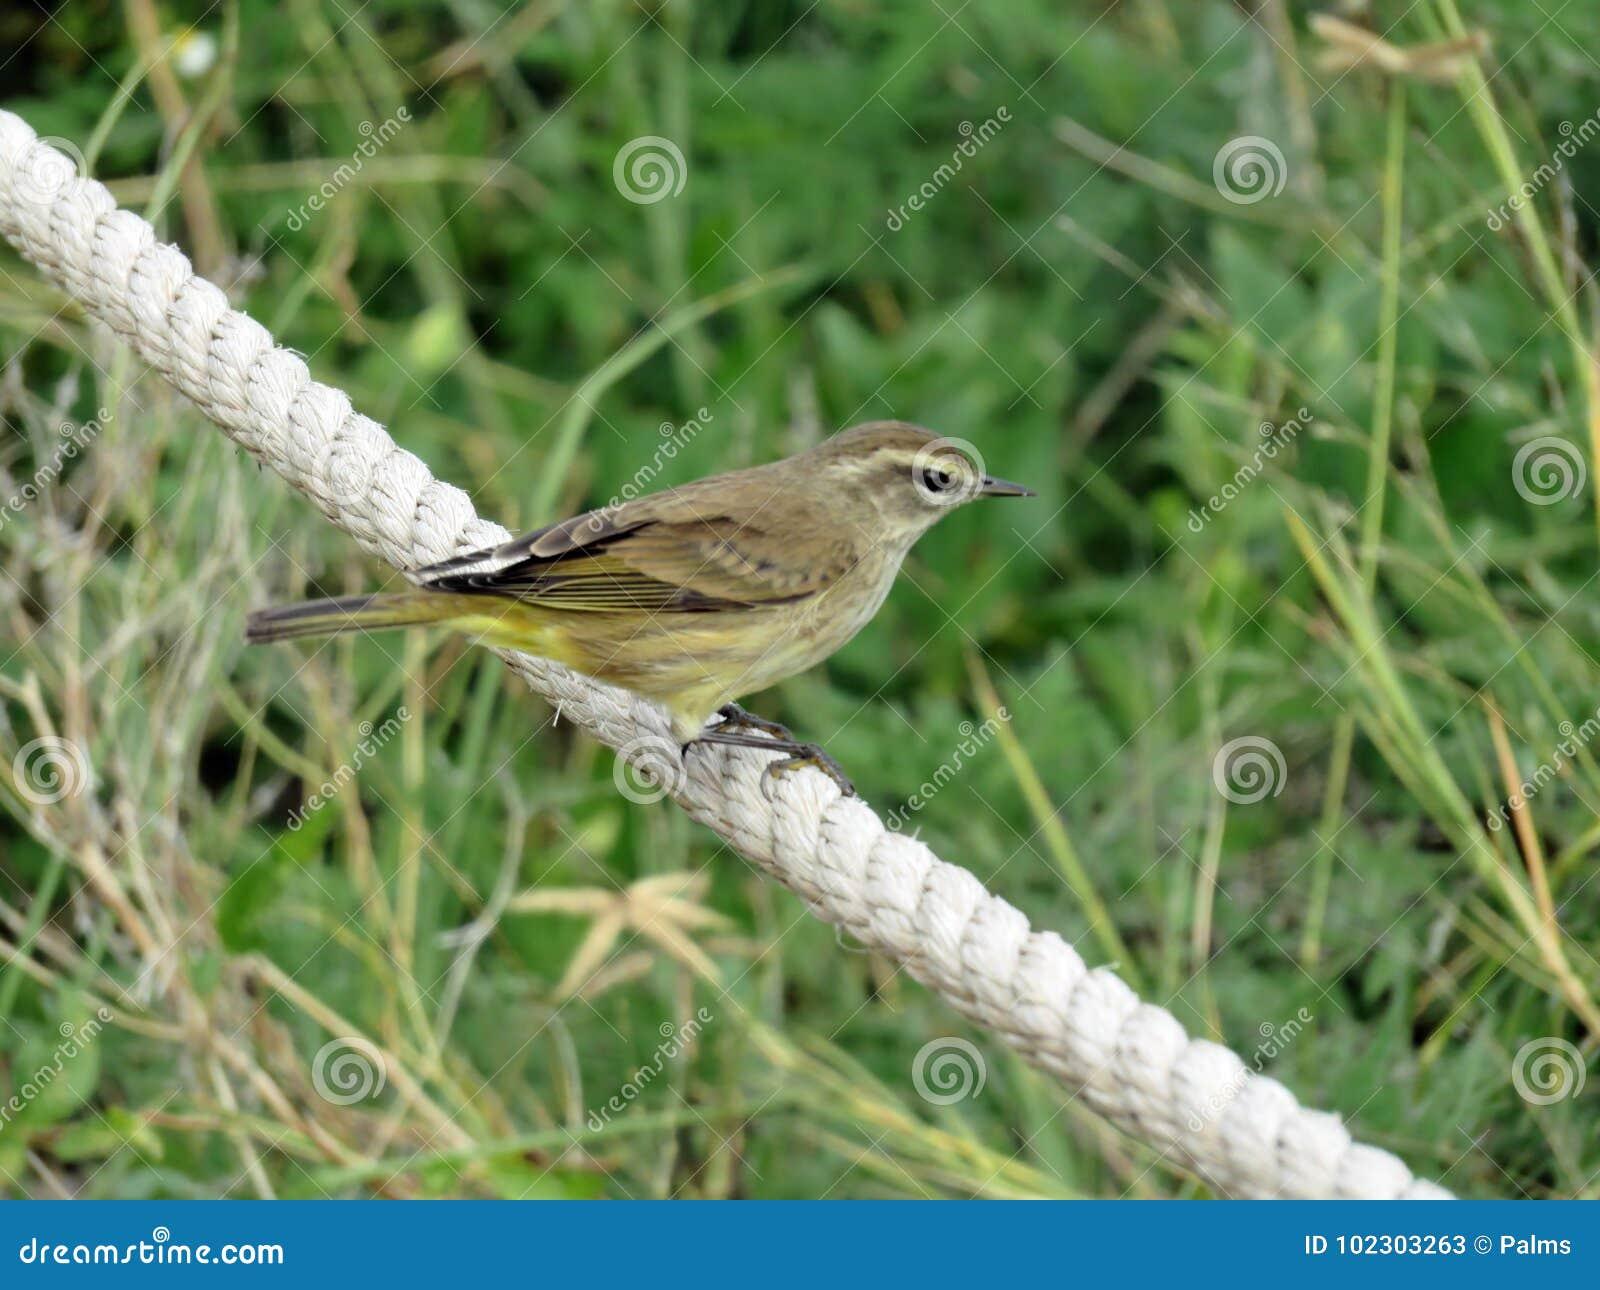 Yellow bird in southwest Florida